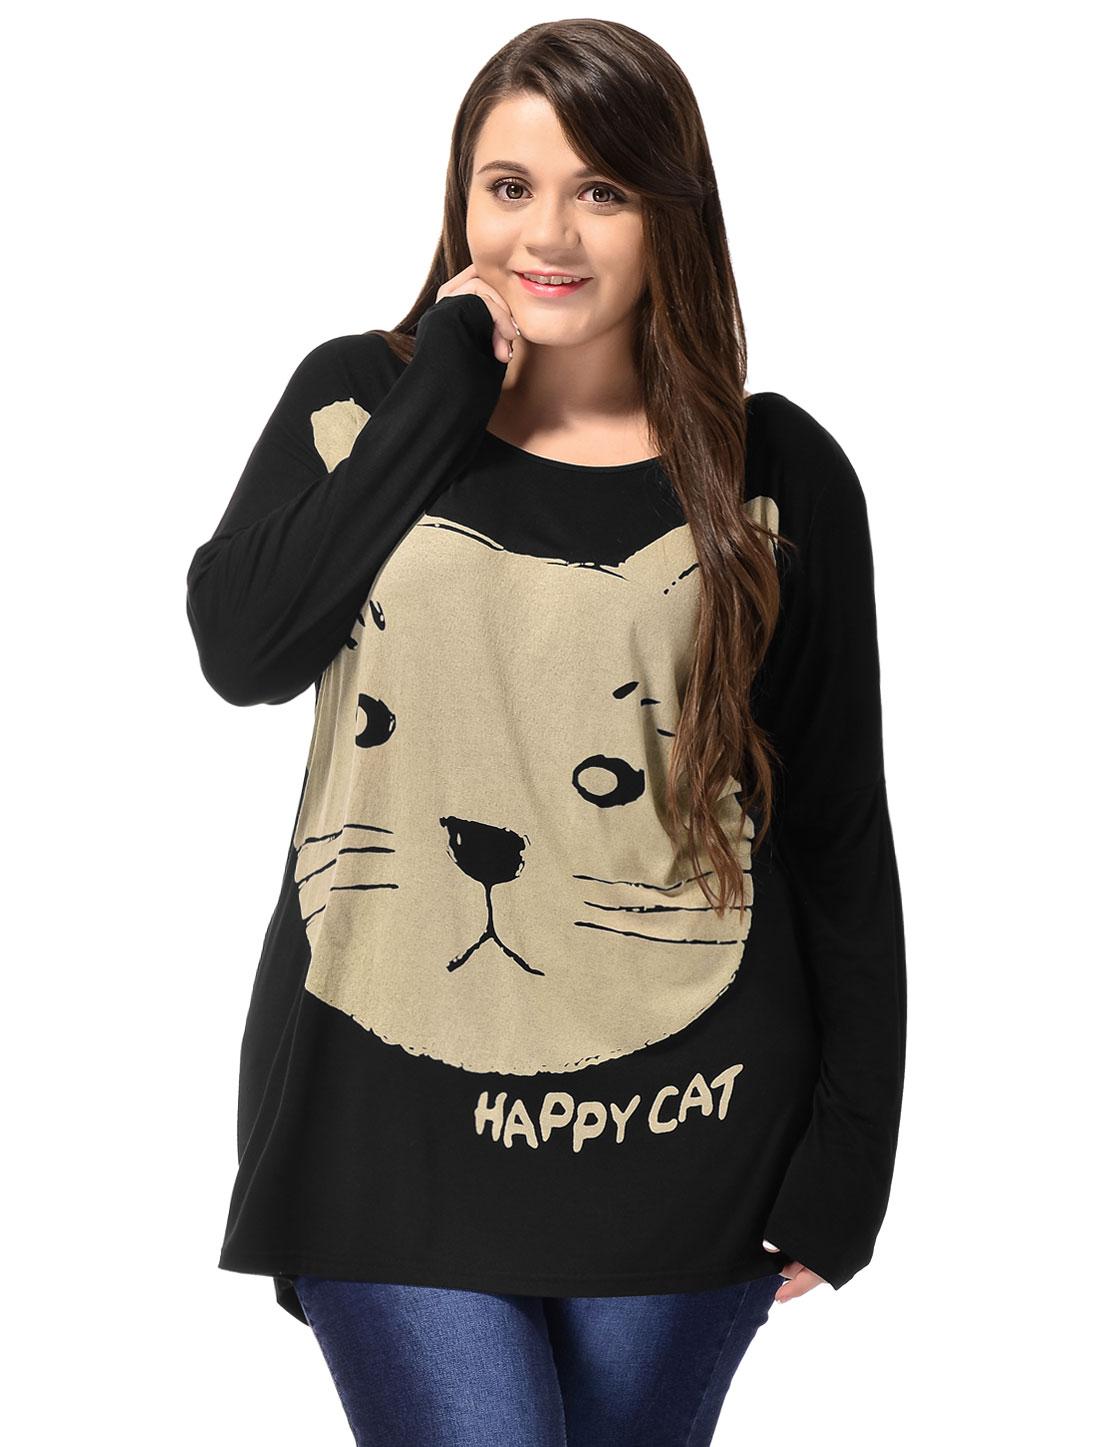 Ladies Black Cat Head Prints Batwing Sleeves Autumn Tee Shirt Plus Size 2X